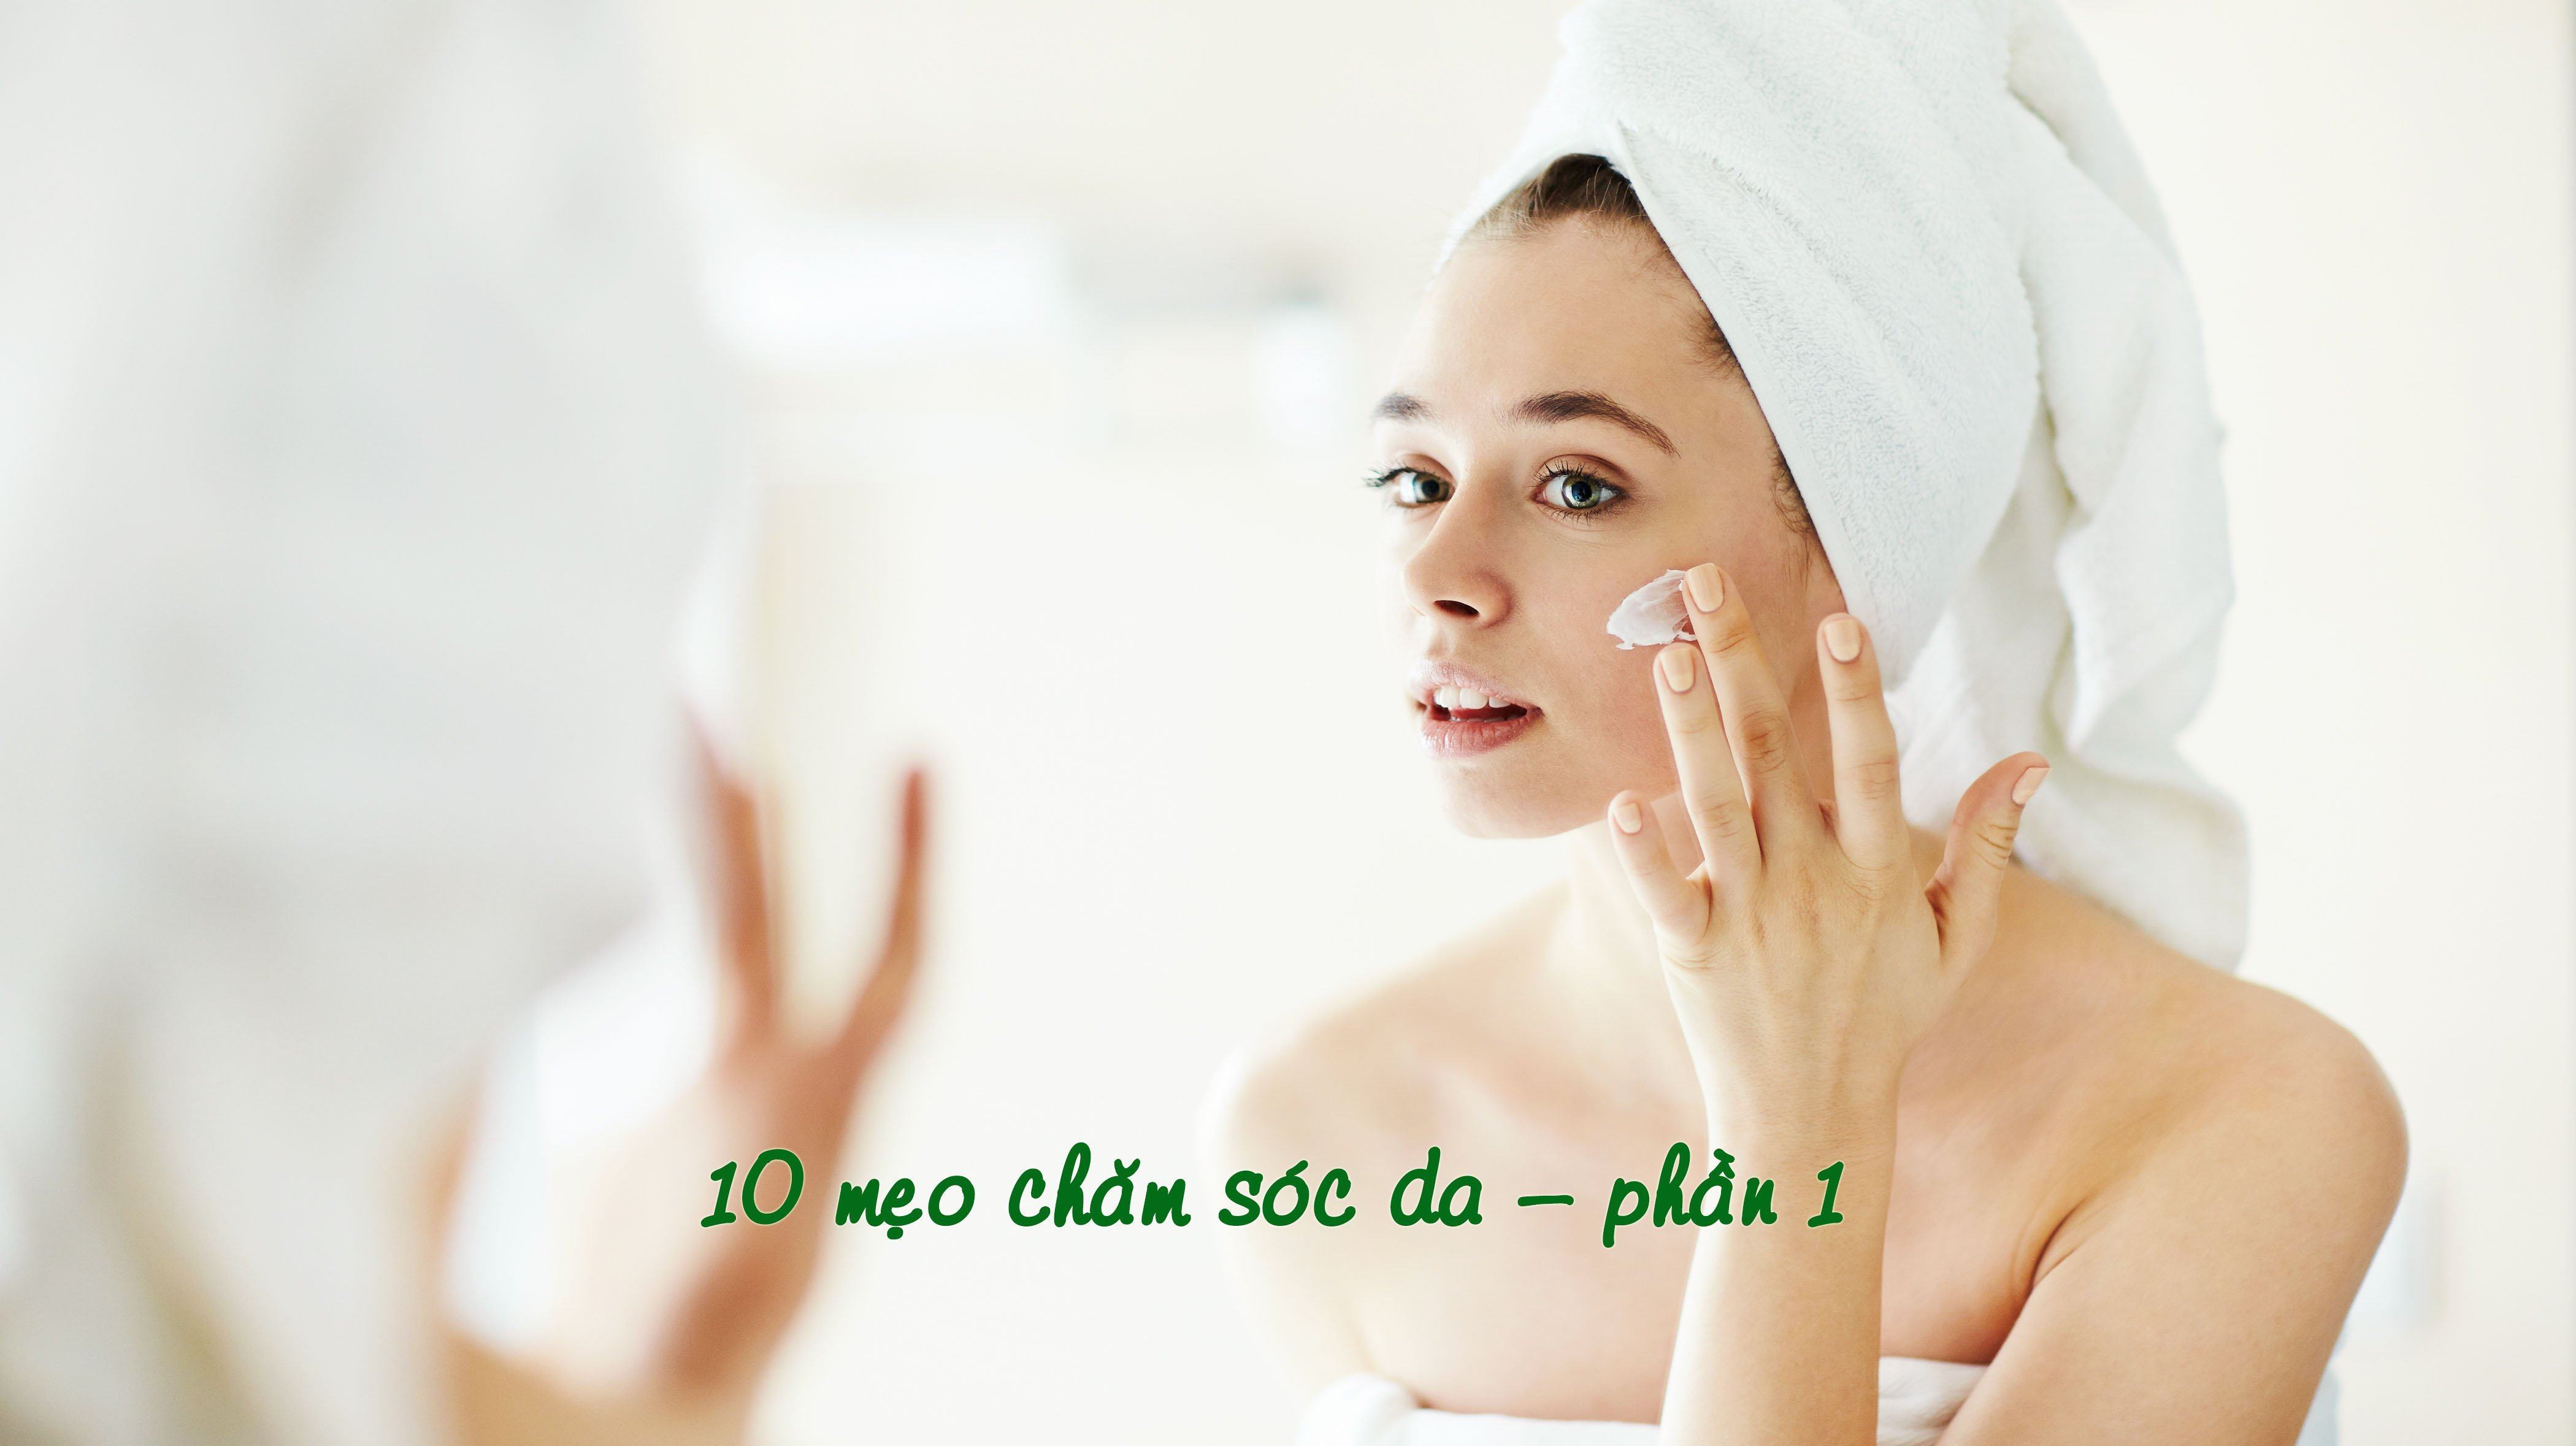 Pretty girl applying moisturizing cream in front of mirror